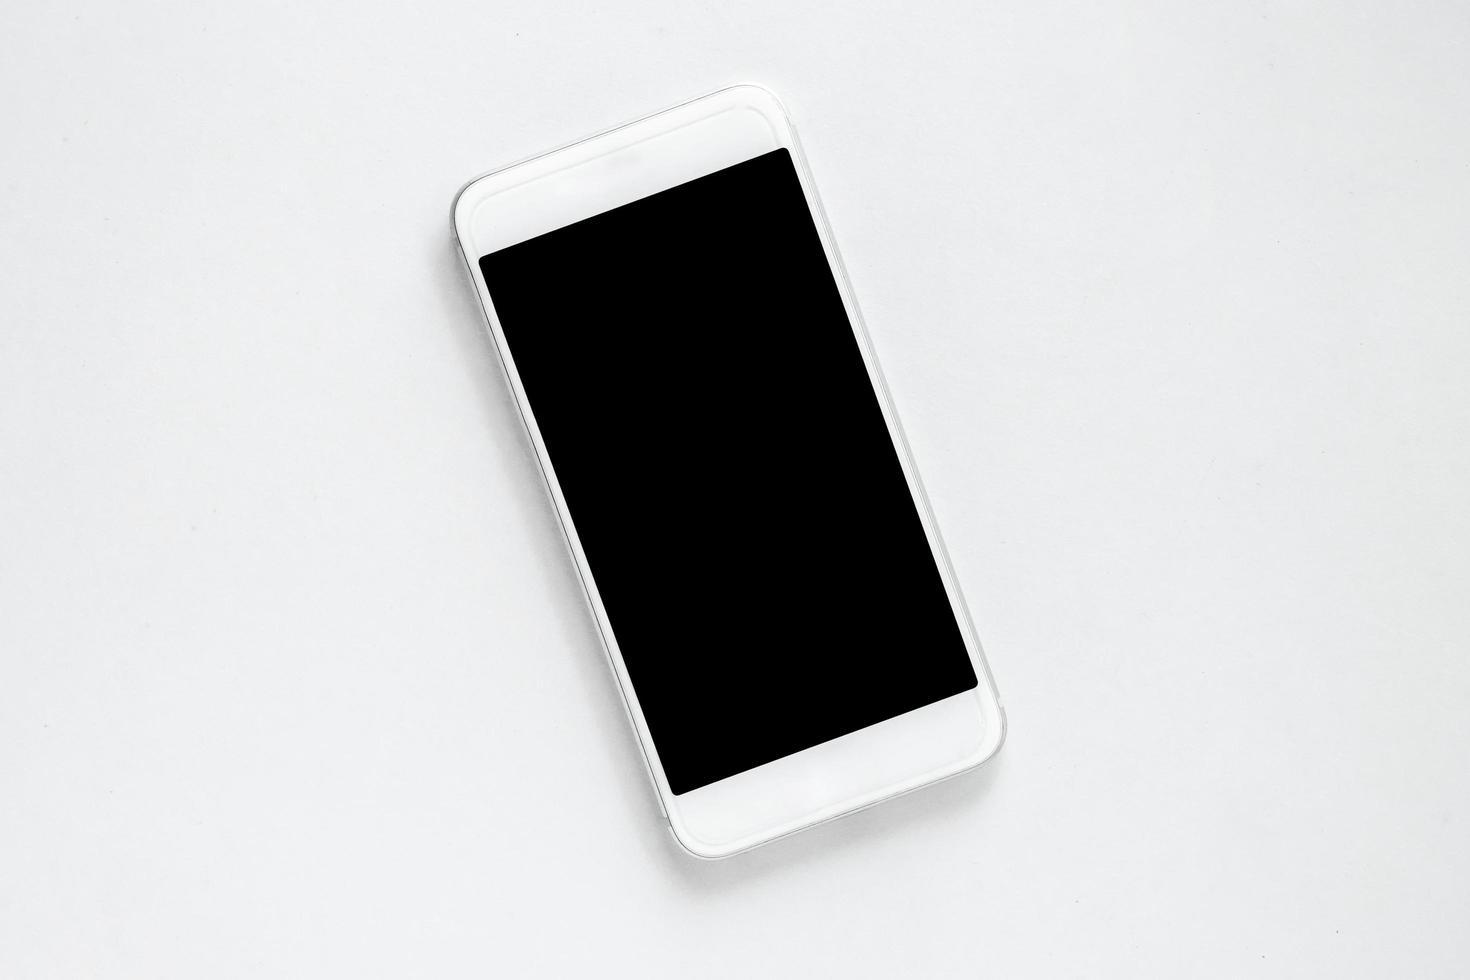 primer plano de un teléfono inteligente foto